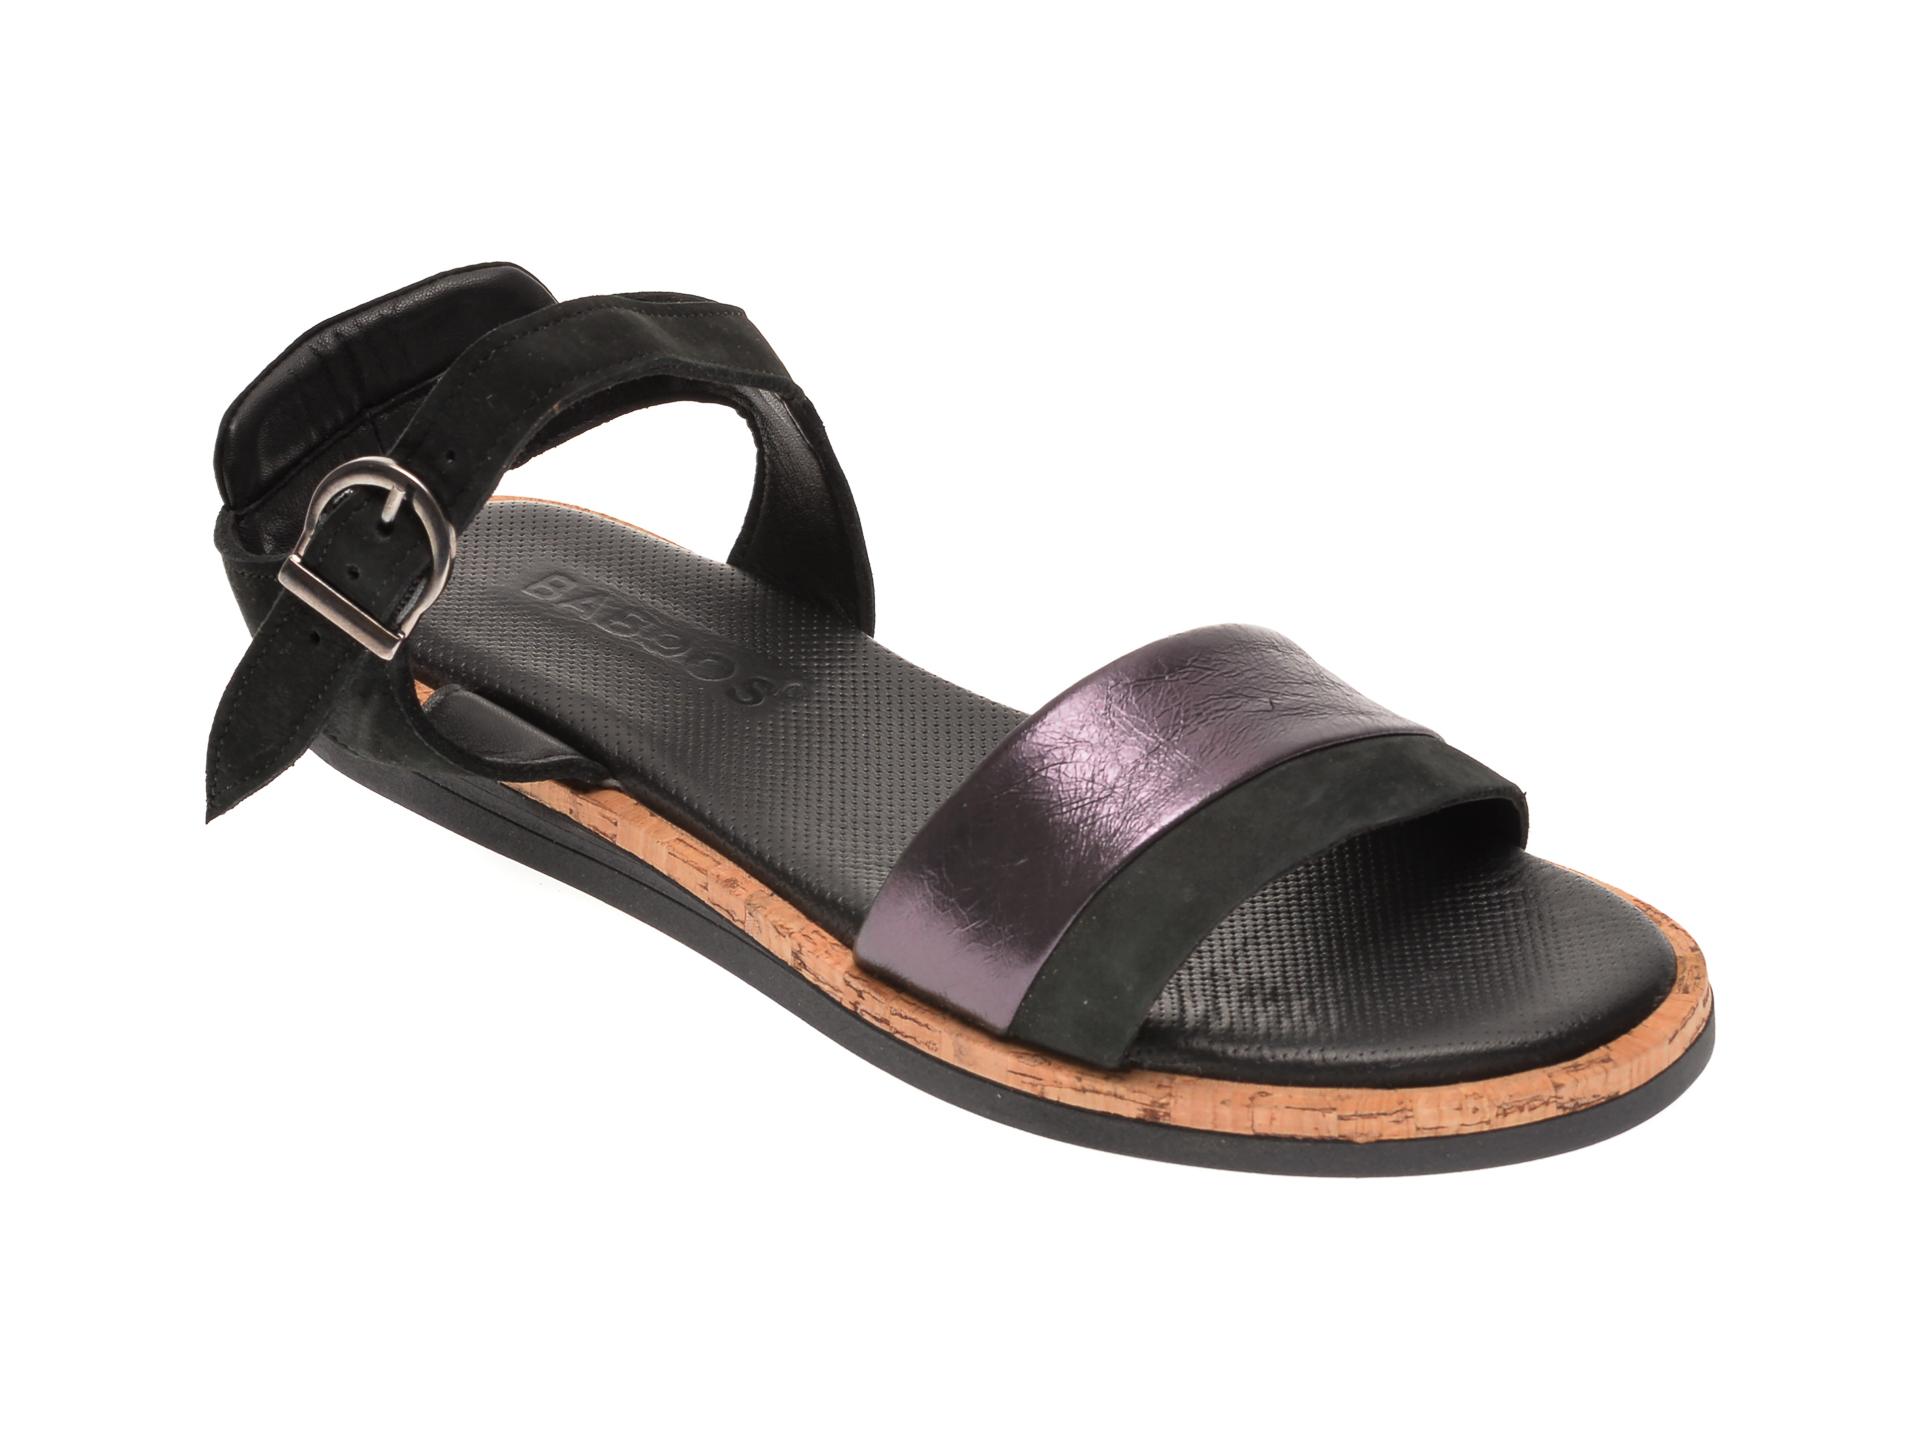 Sandale BABOOS negre, 3101, din piele naturala